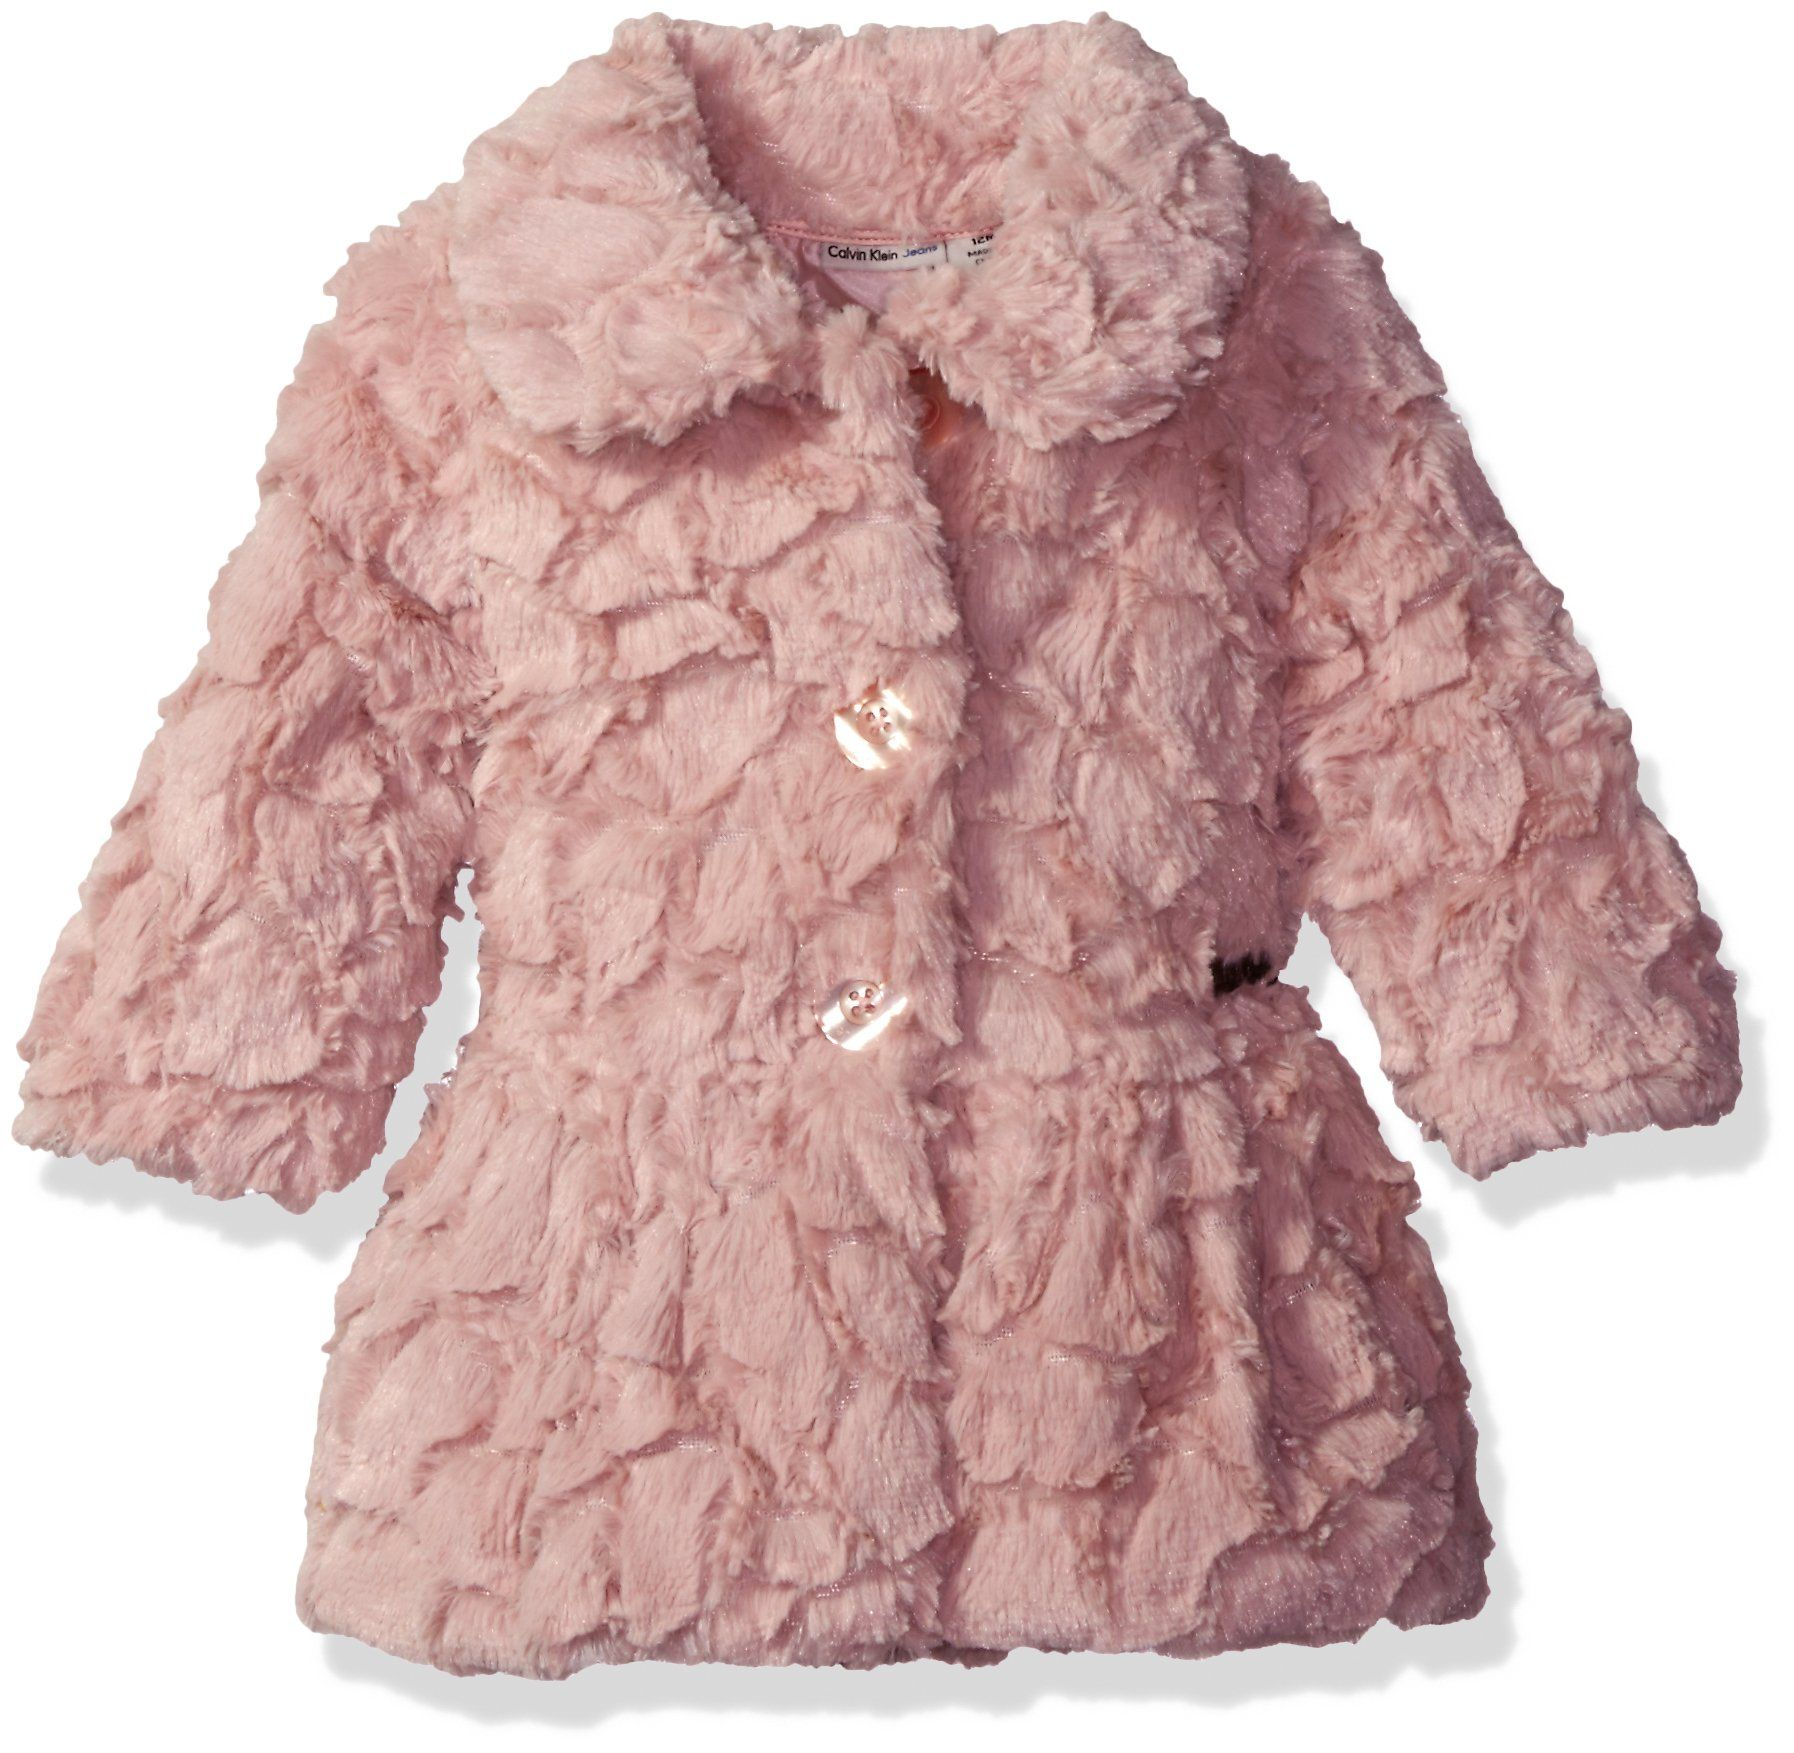 Calvin Klein Baby Girls Faux Fur Jacket Light Pink 24m Girls Faux Fur Jacket Long Sleeve Faux Fur Coat Calvin Klein Baby